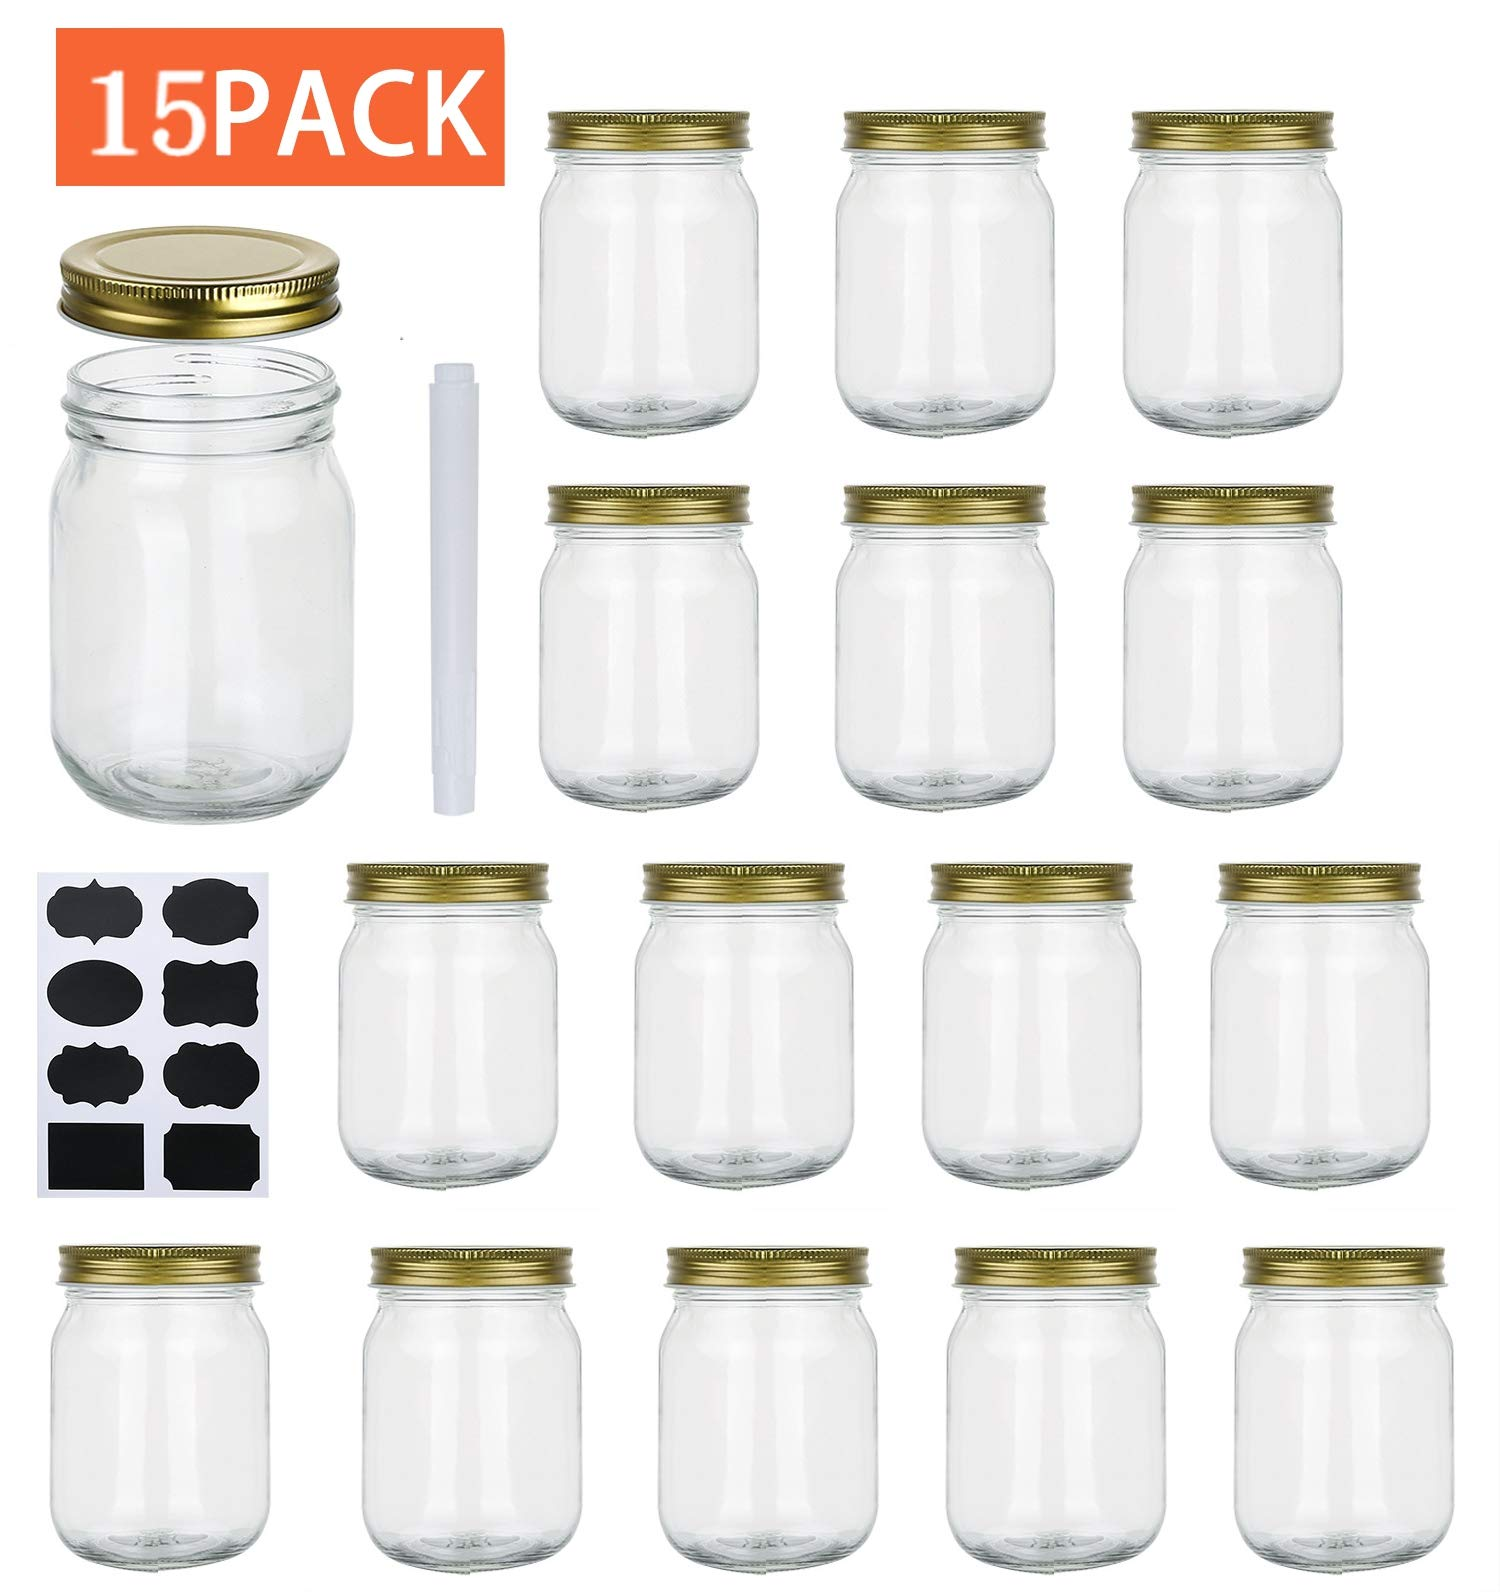 Encheng 16 oz Glass Jars With Lids,Regular Mouth Ball Mason Jars For Storage,Canning Jars For PIckles,Herb,Jelly,Jams,Honey,Dishware Safe,Set Of 15